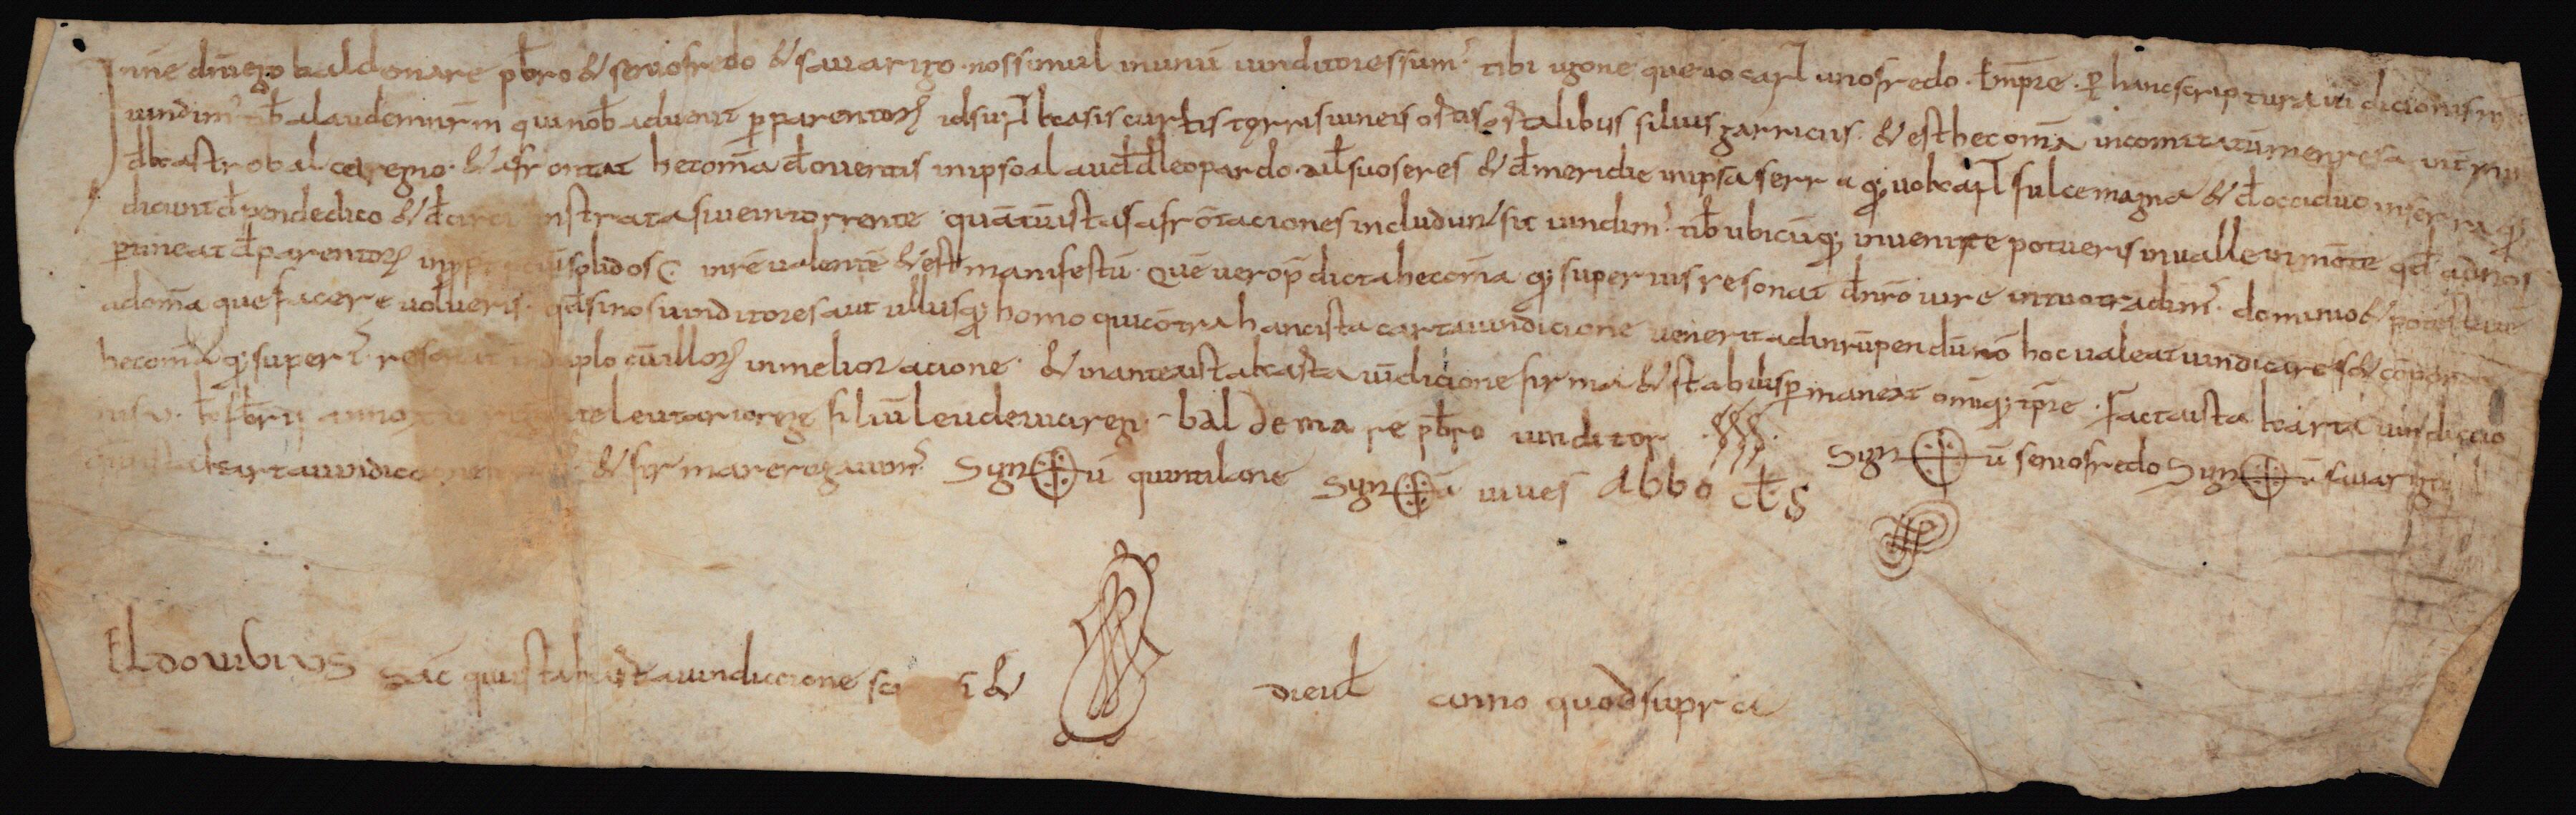 Biblioteca de Catalunya, pergamins 3096, bearing Baldemar's signature in the middle of the witness list